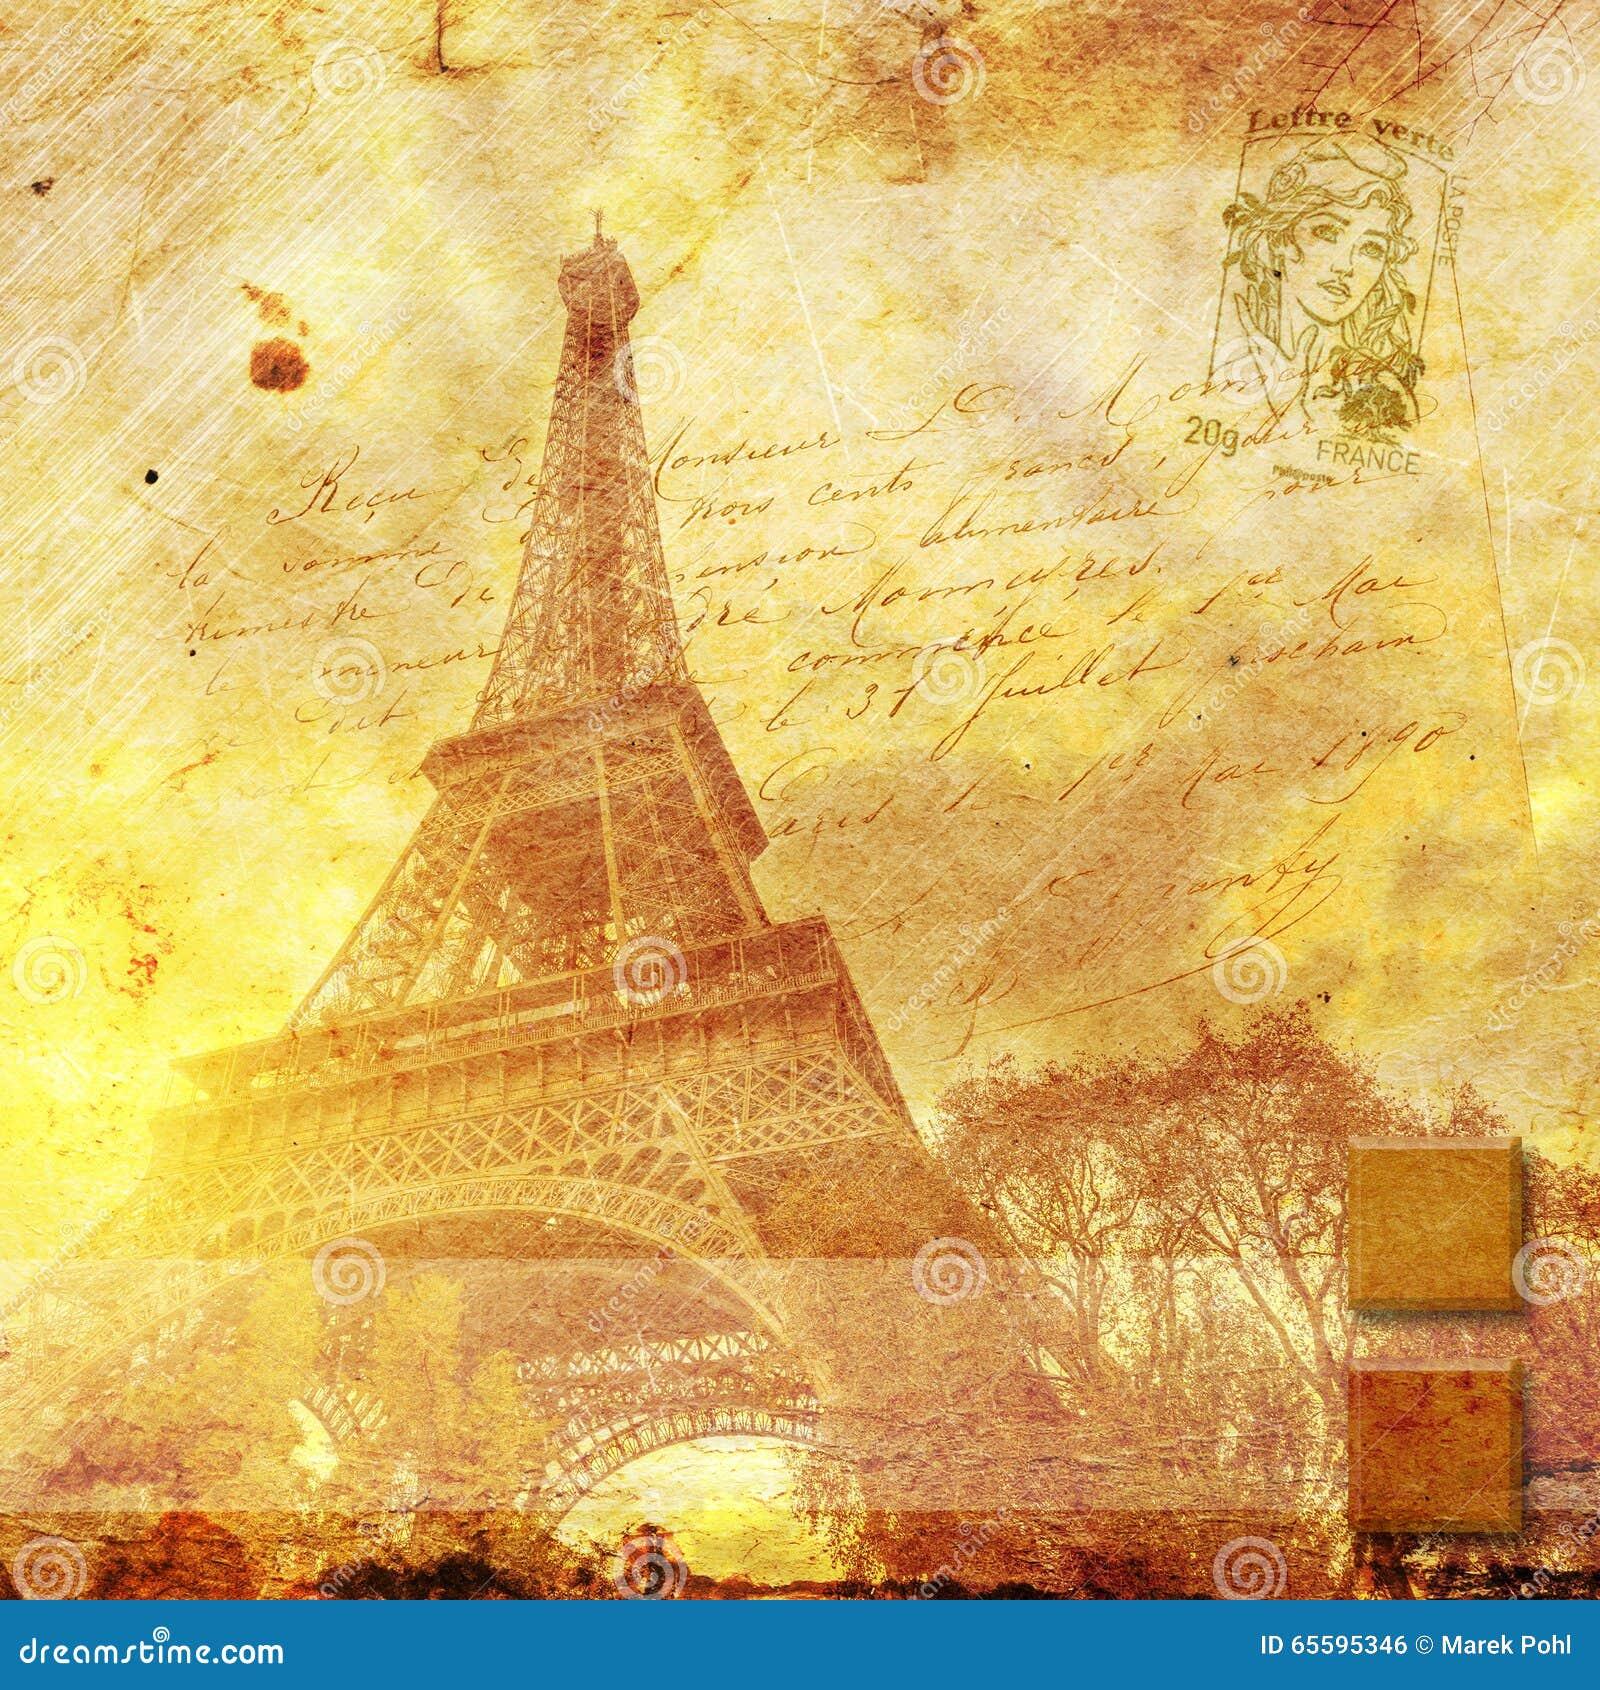 Eiffel Tower Paris, Abstract Digital Art Stock Photo - Image of ...